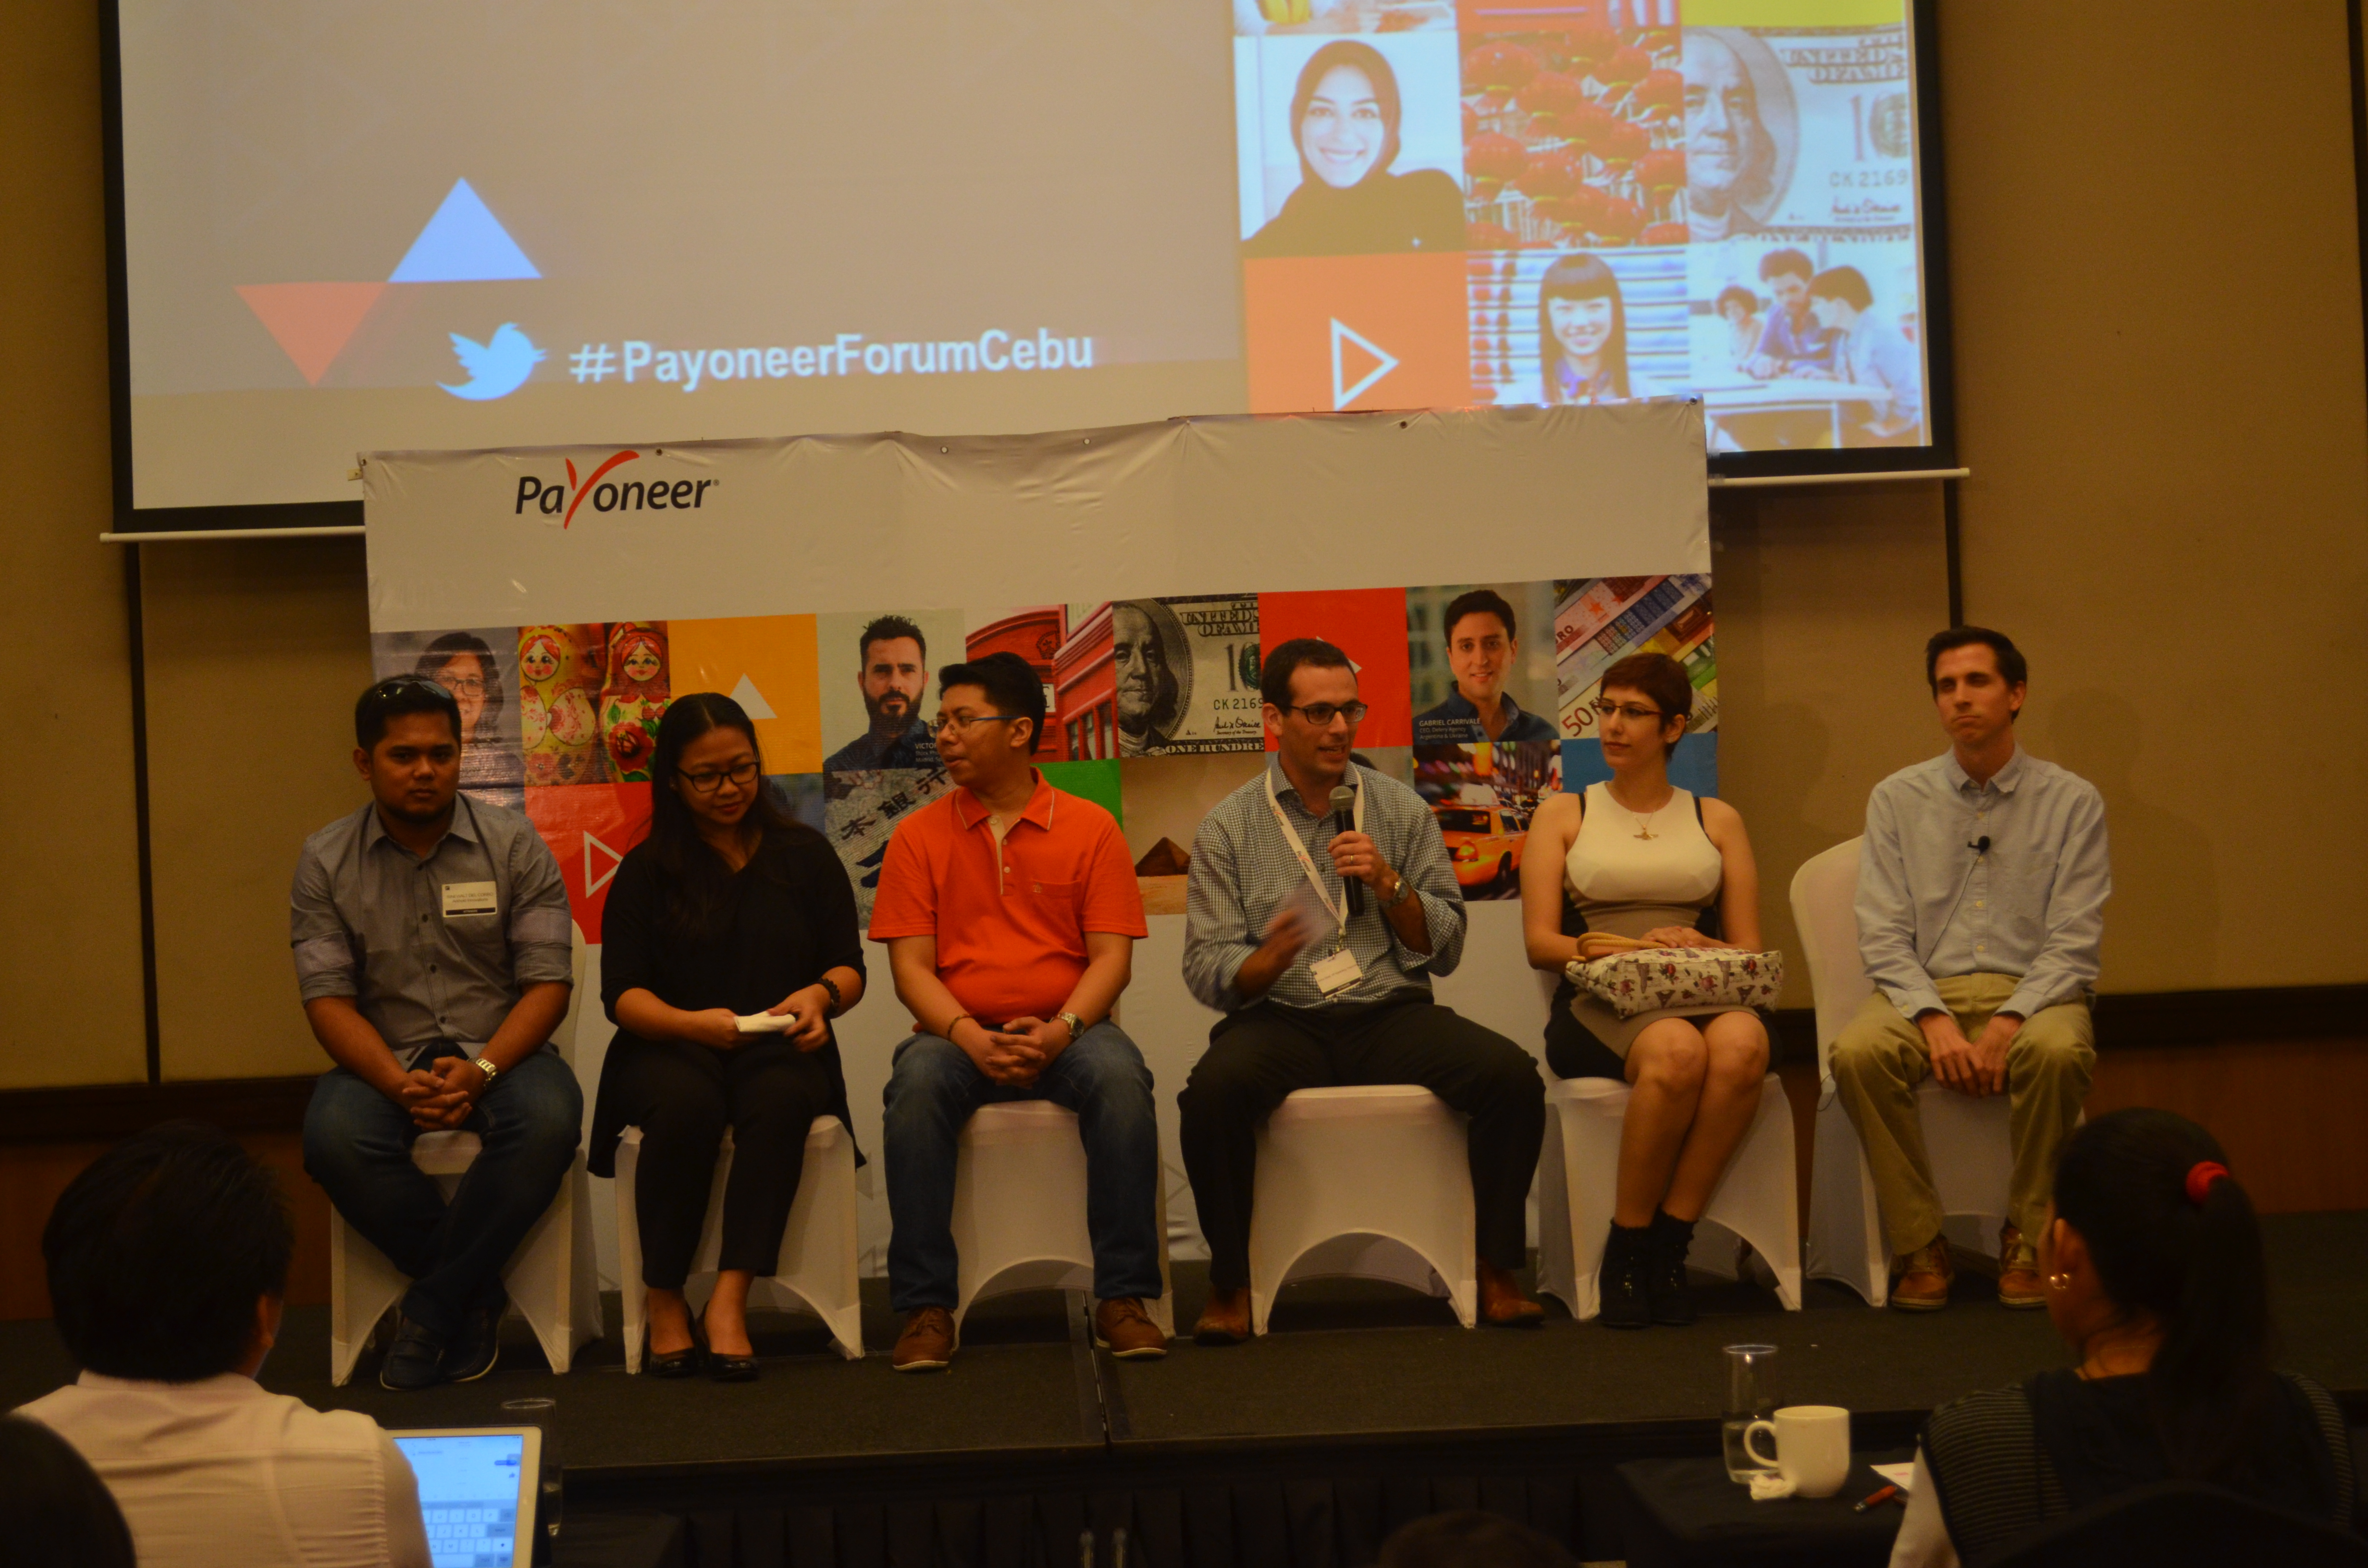 Payoneer Forum Cebu